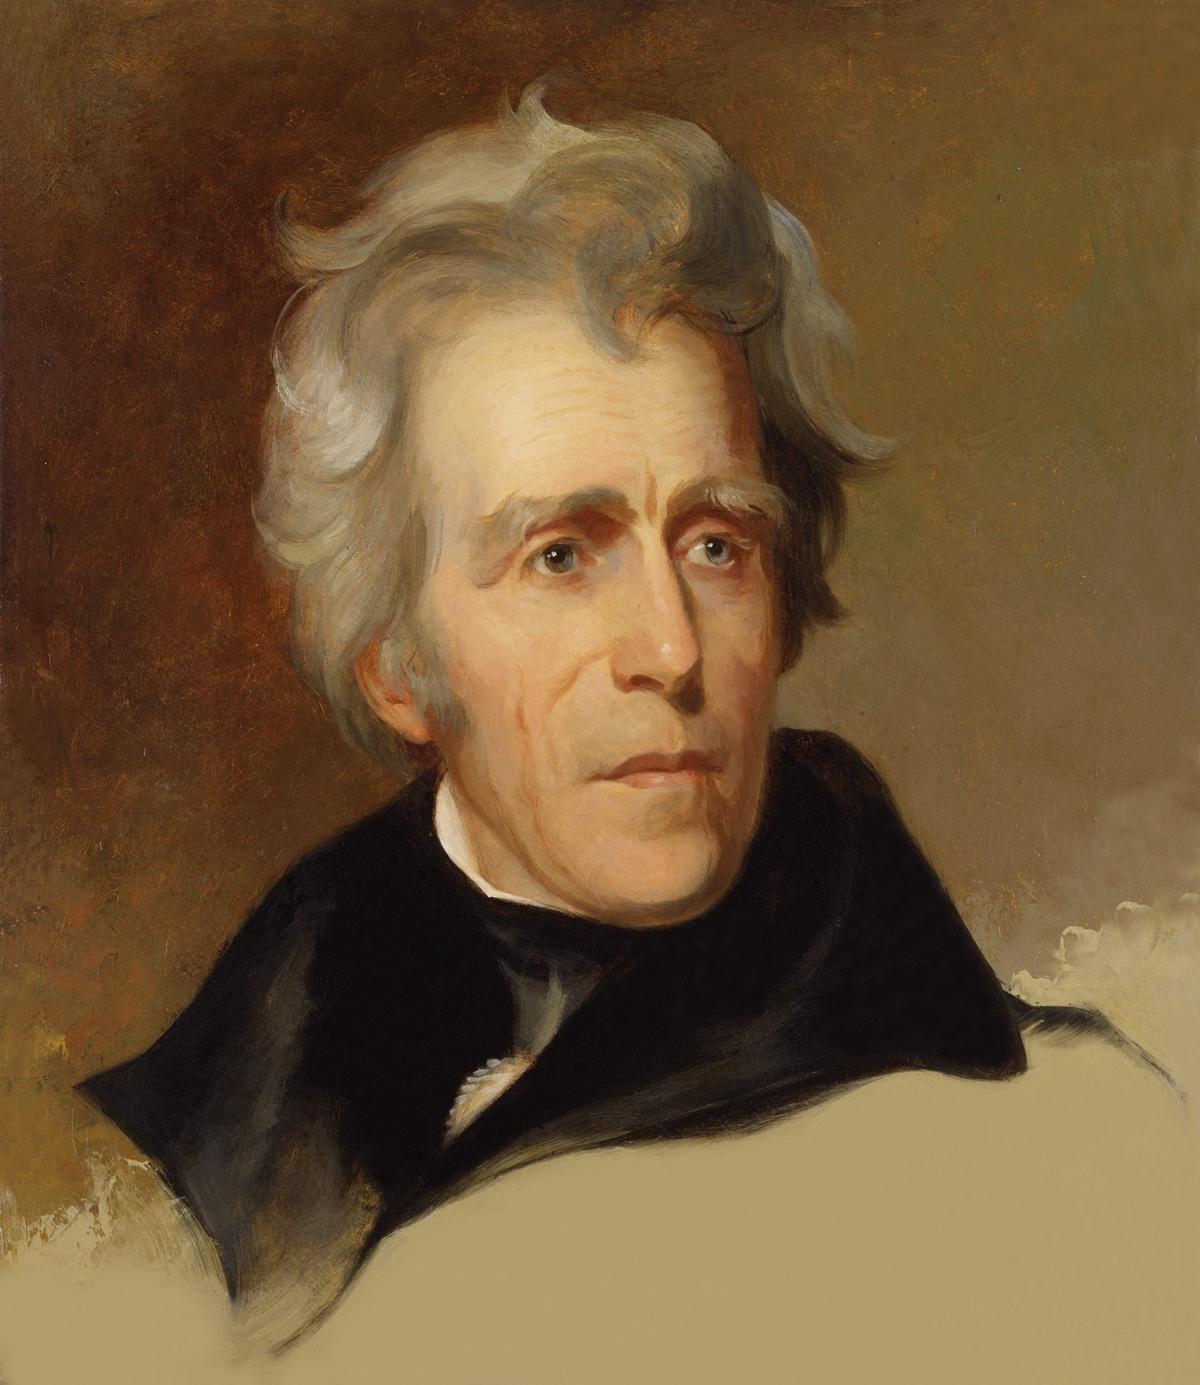 Carroll Bryant: The Presidents: Andrew Jackson Andrew Jackson